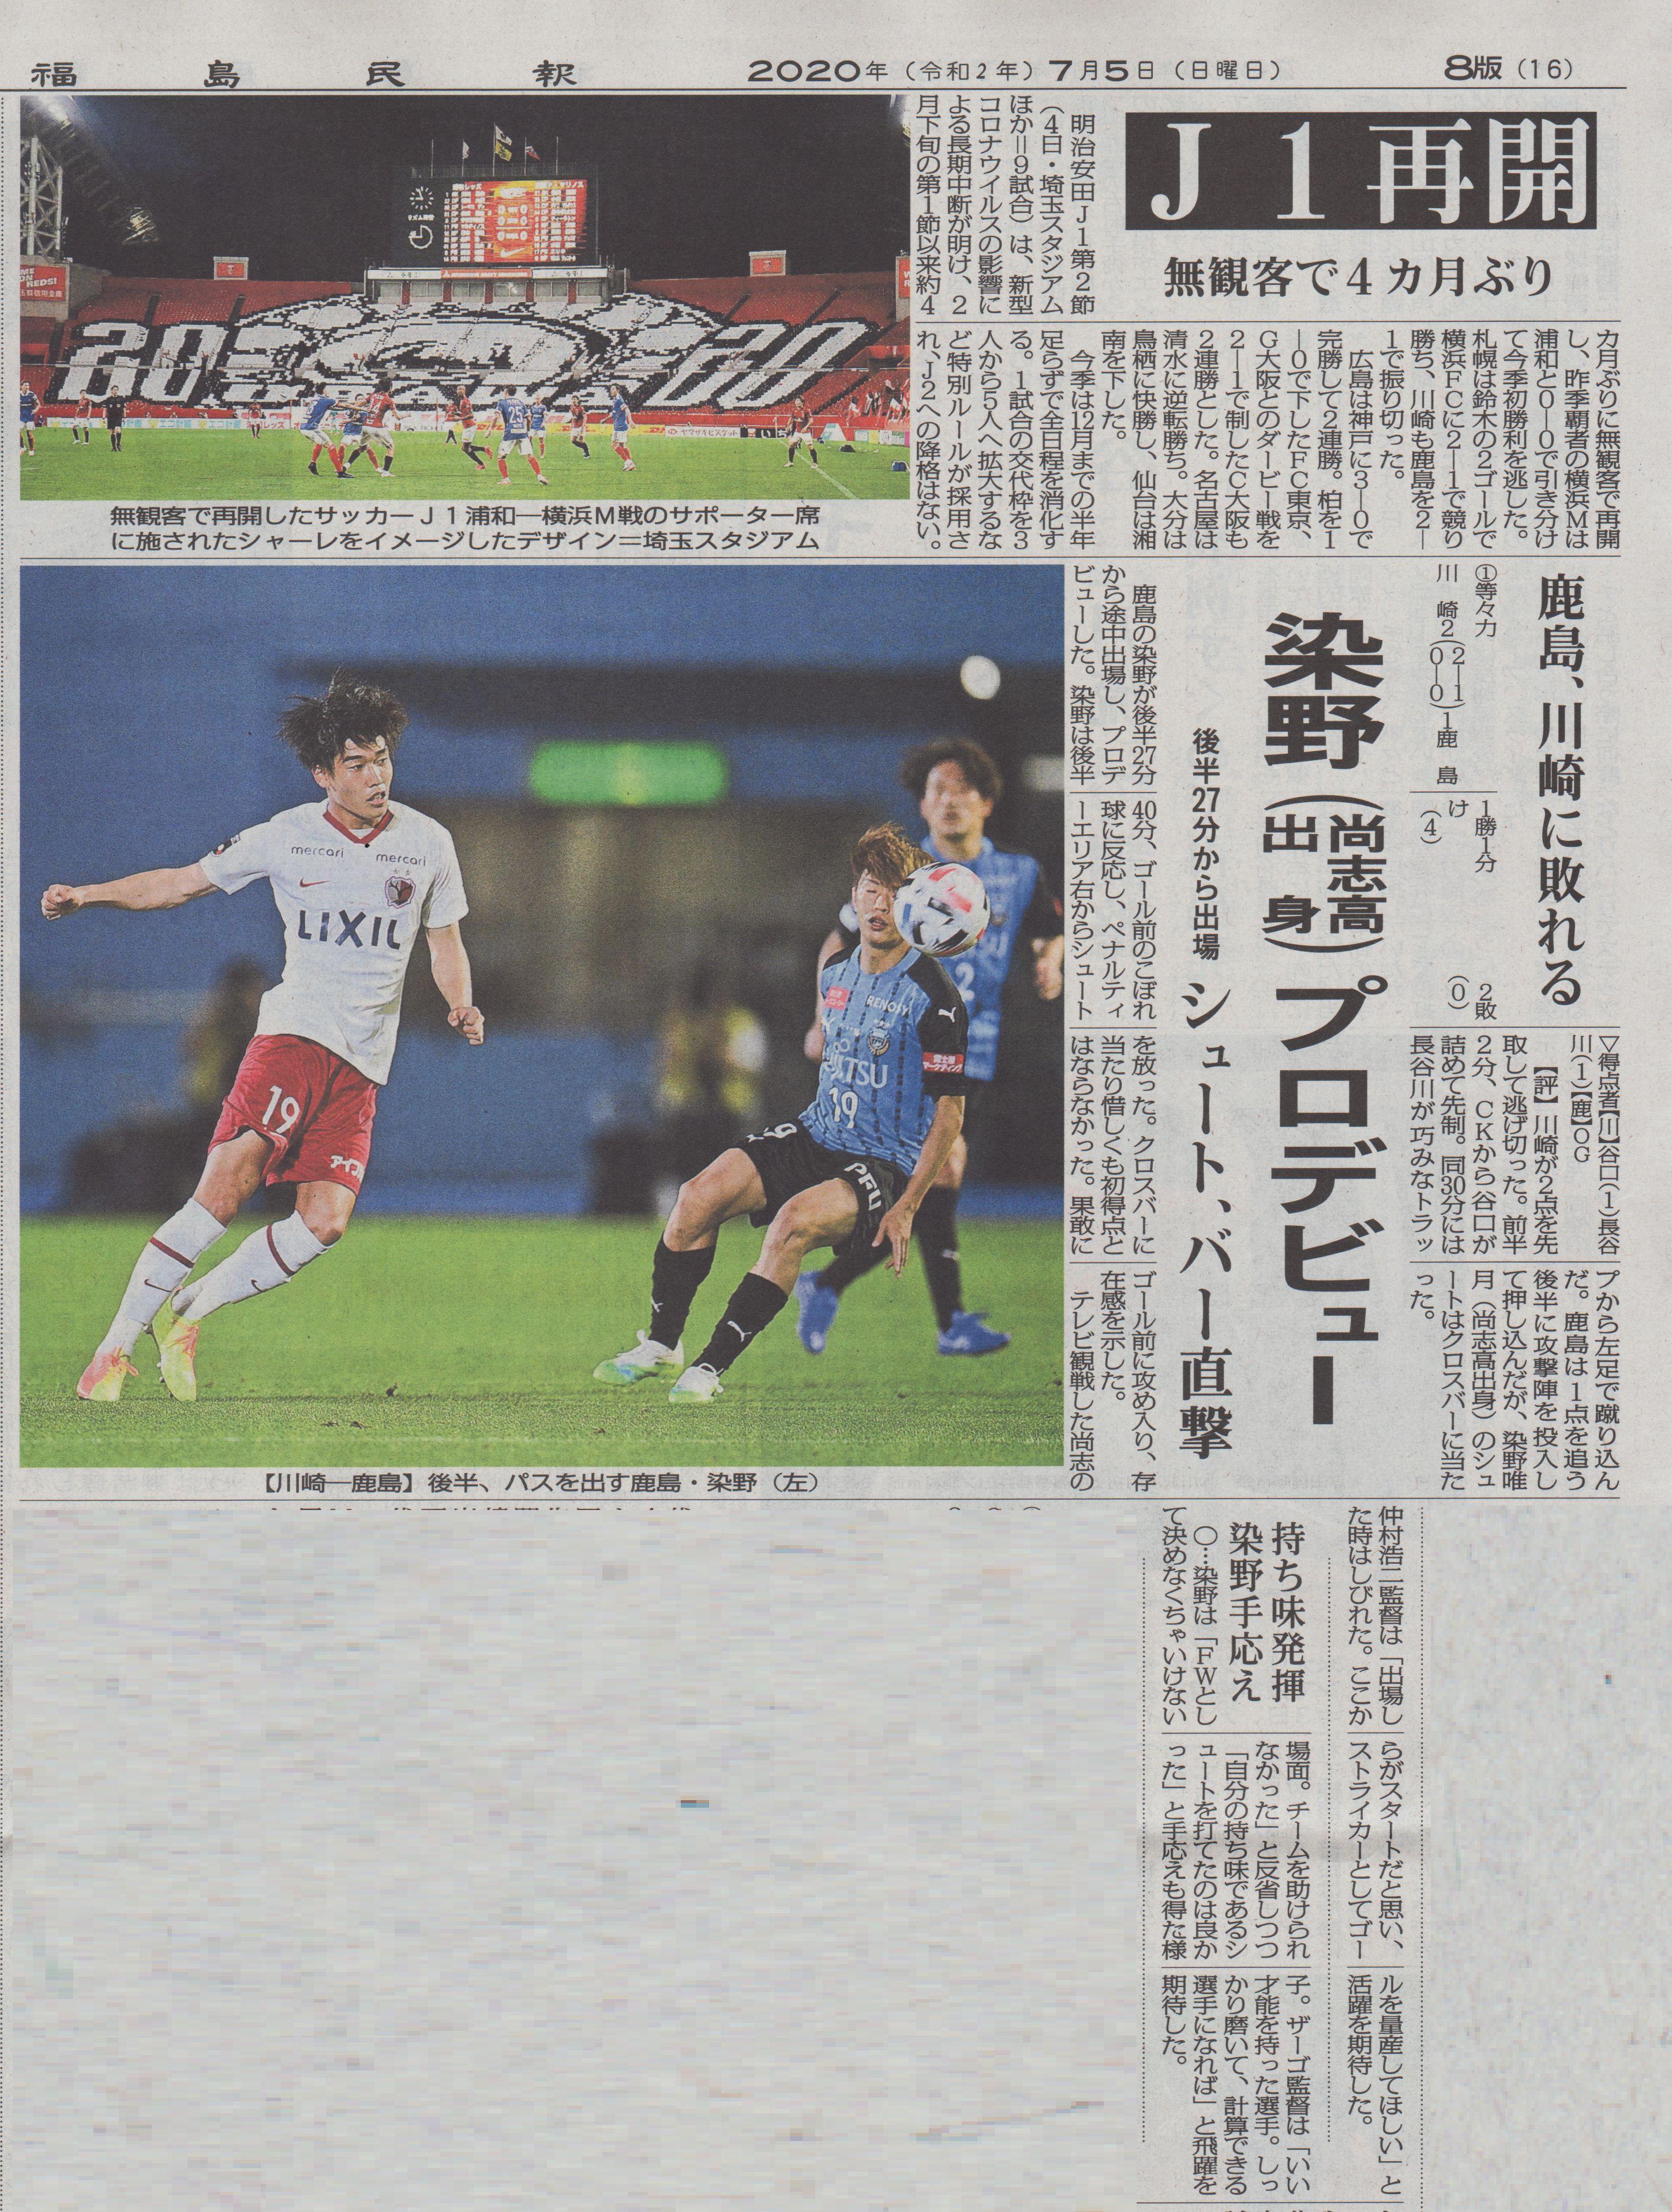 http://www2.shoshi.ed.jp/club/2020.06.05_minpo.jpg